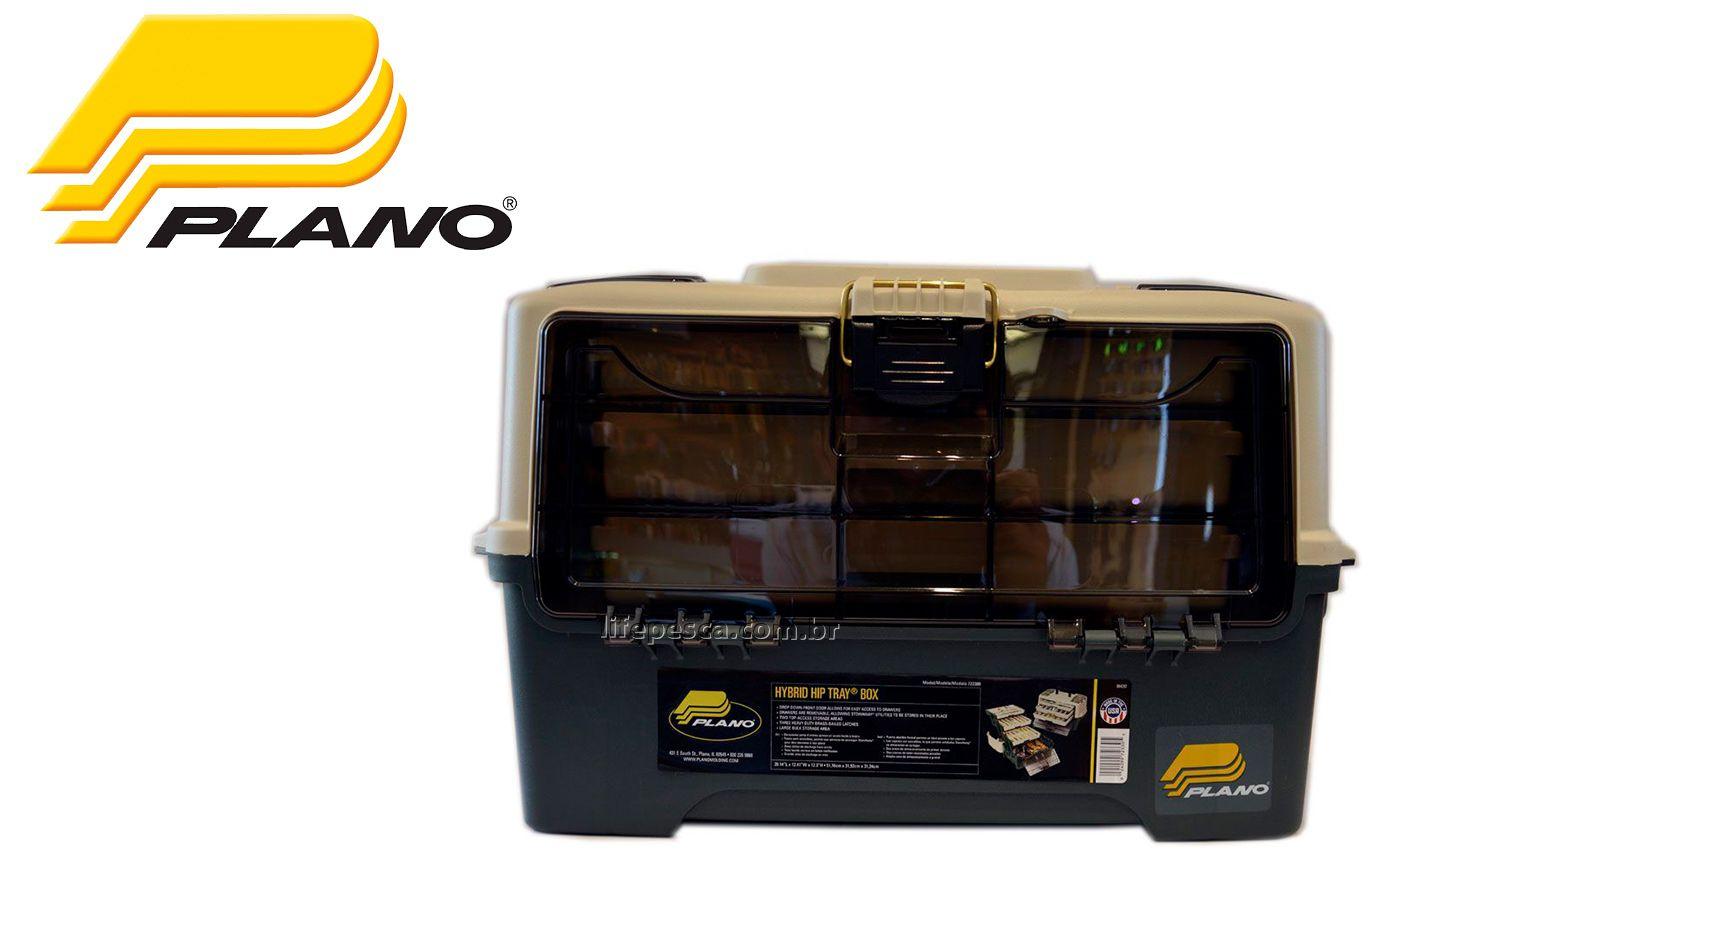 Caixa de Pesca Plano - HY Brid Hip Box Drawer 3 Bandejas de Gavetas  - 723300